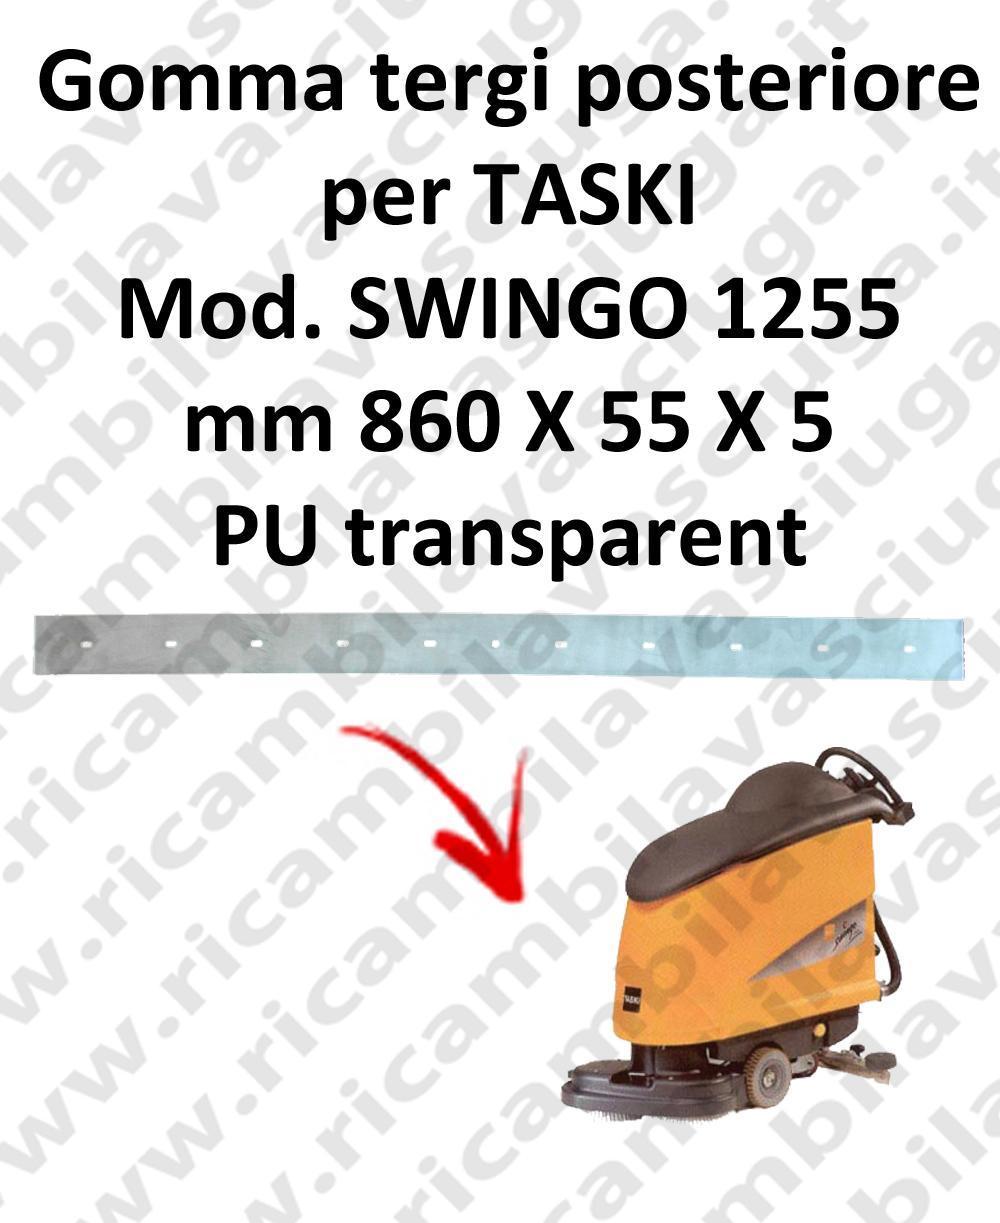 Bavette ARRIERE pour autolaveuses TASKI modele SWINGO 1255